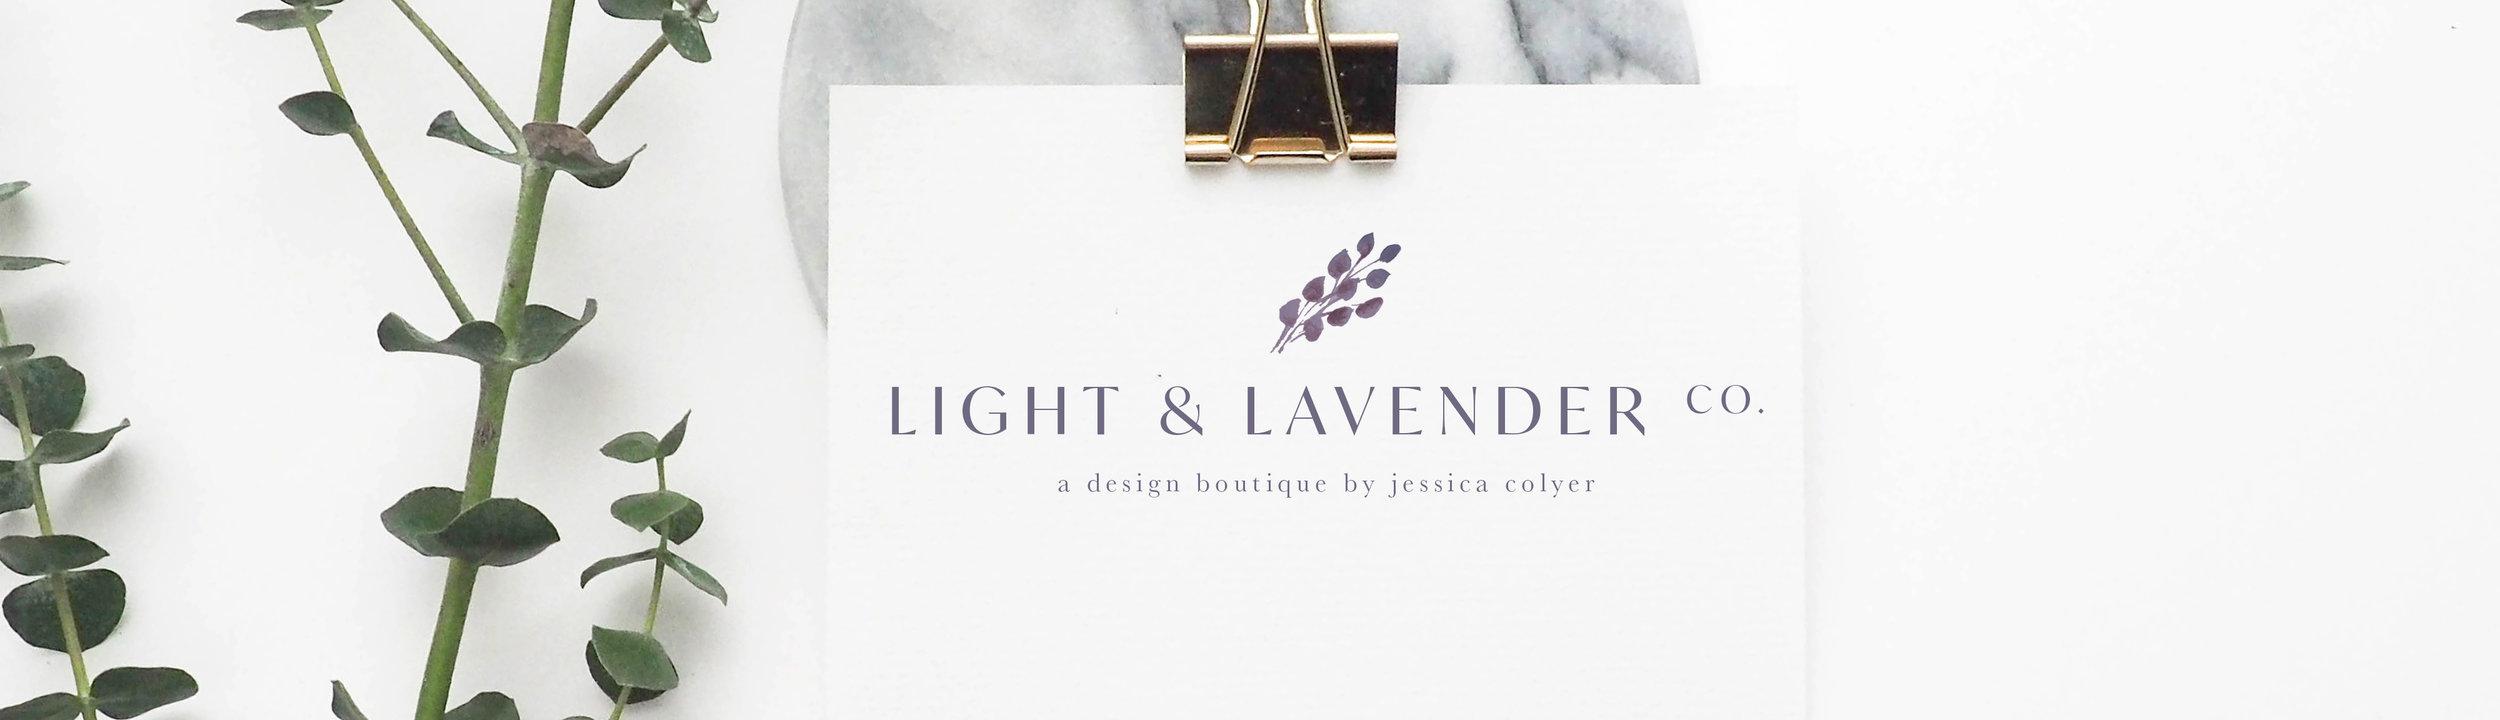 Etsy Shop | Light & Lavender Co.